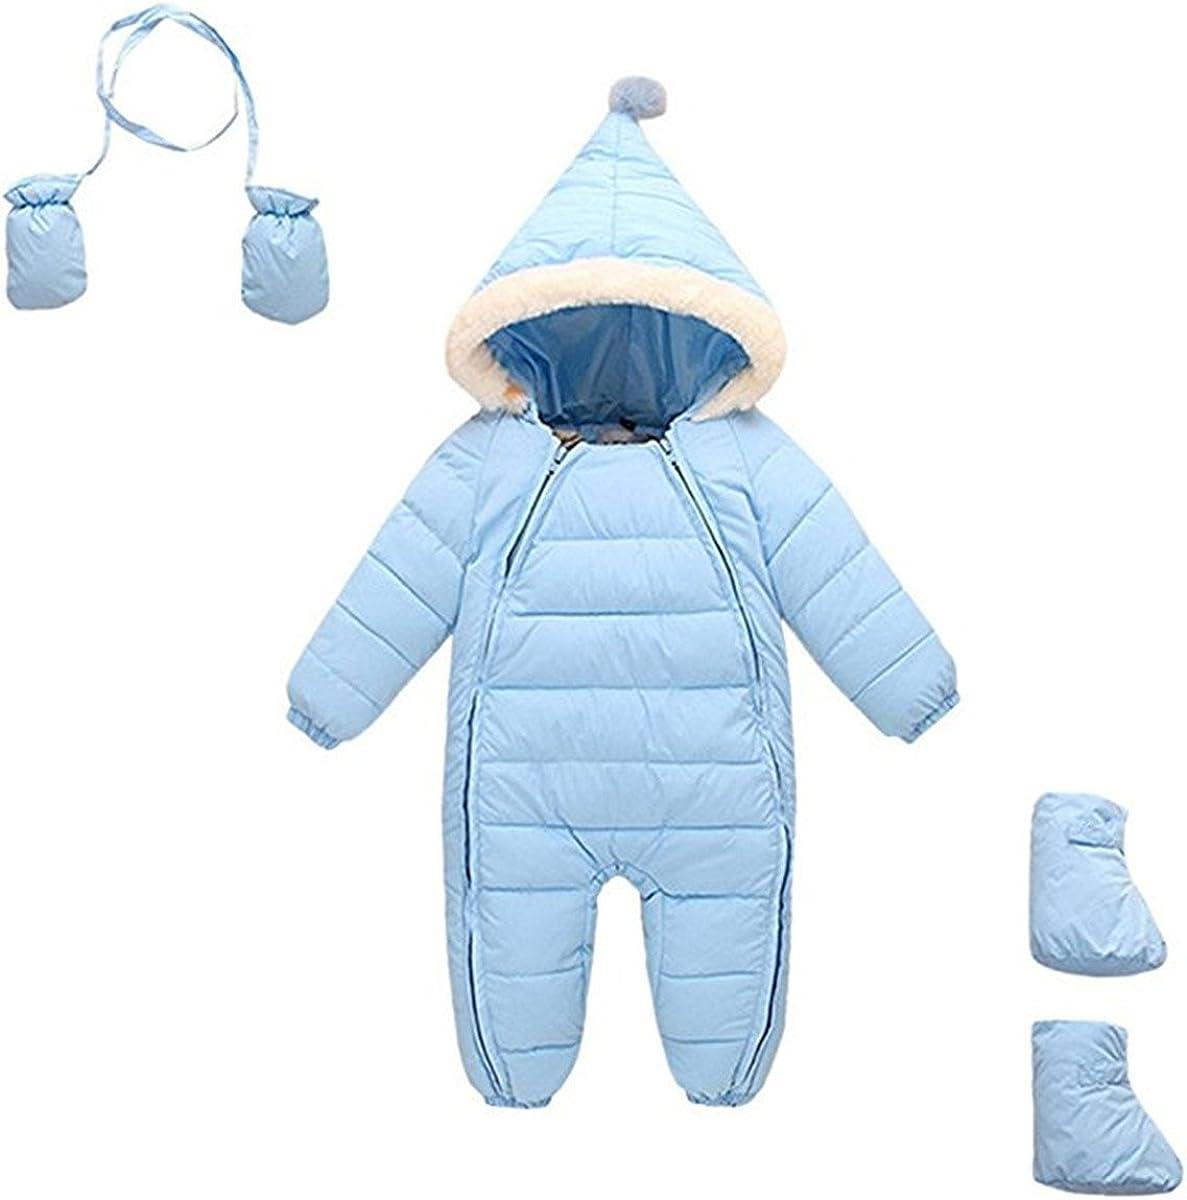 JELEUON 3Pcs Baby Girls Boys One Piece Zipper Down Jacket Winter Romper Jumpsuit Romper+Gloves+Shoes